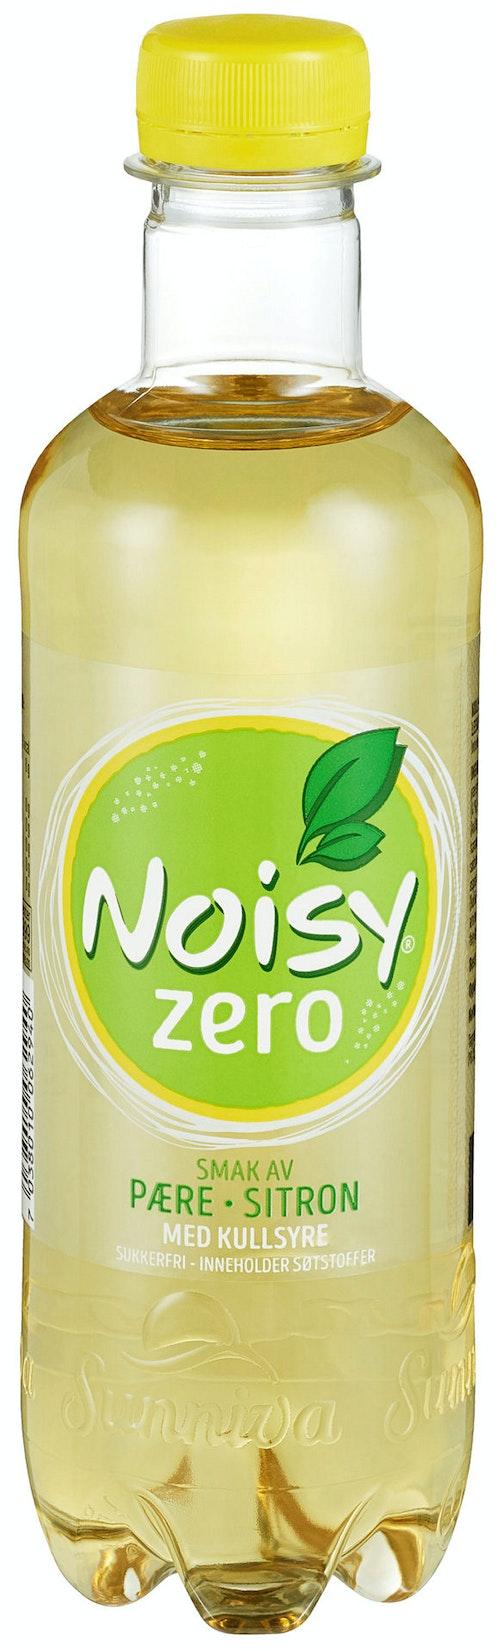 Tine Noisy ZERO Pære og Sitron 0,4 dl